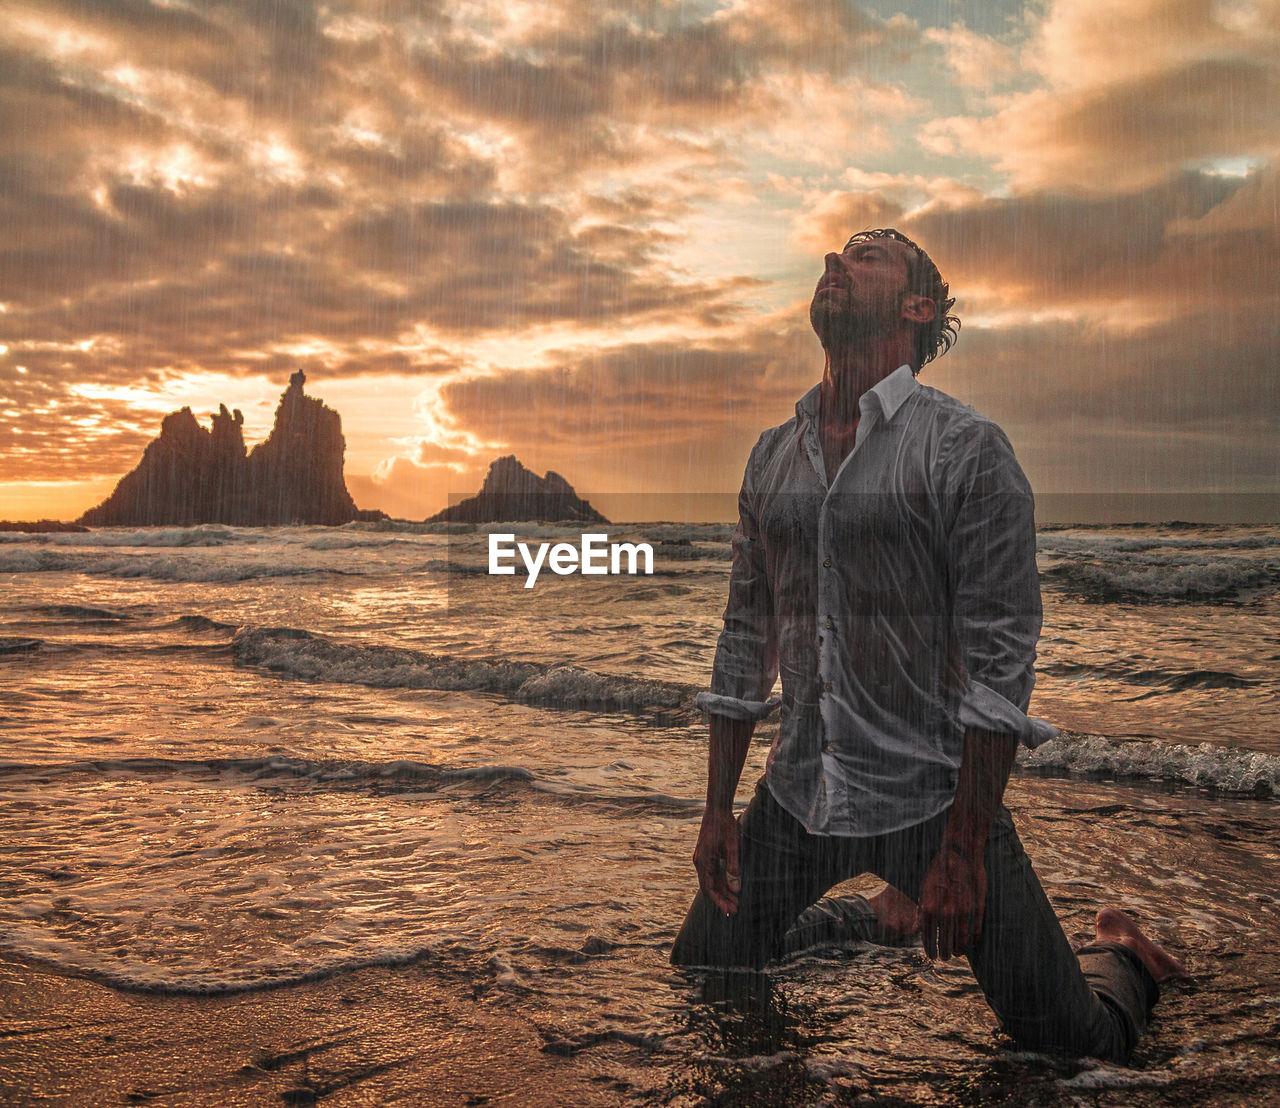 Man kneeling on beach against sky during sunset